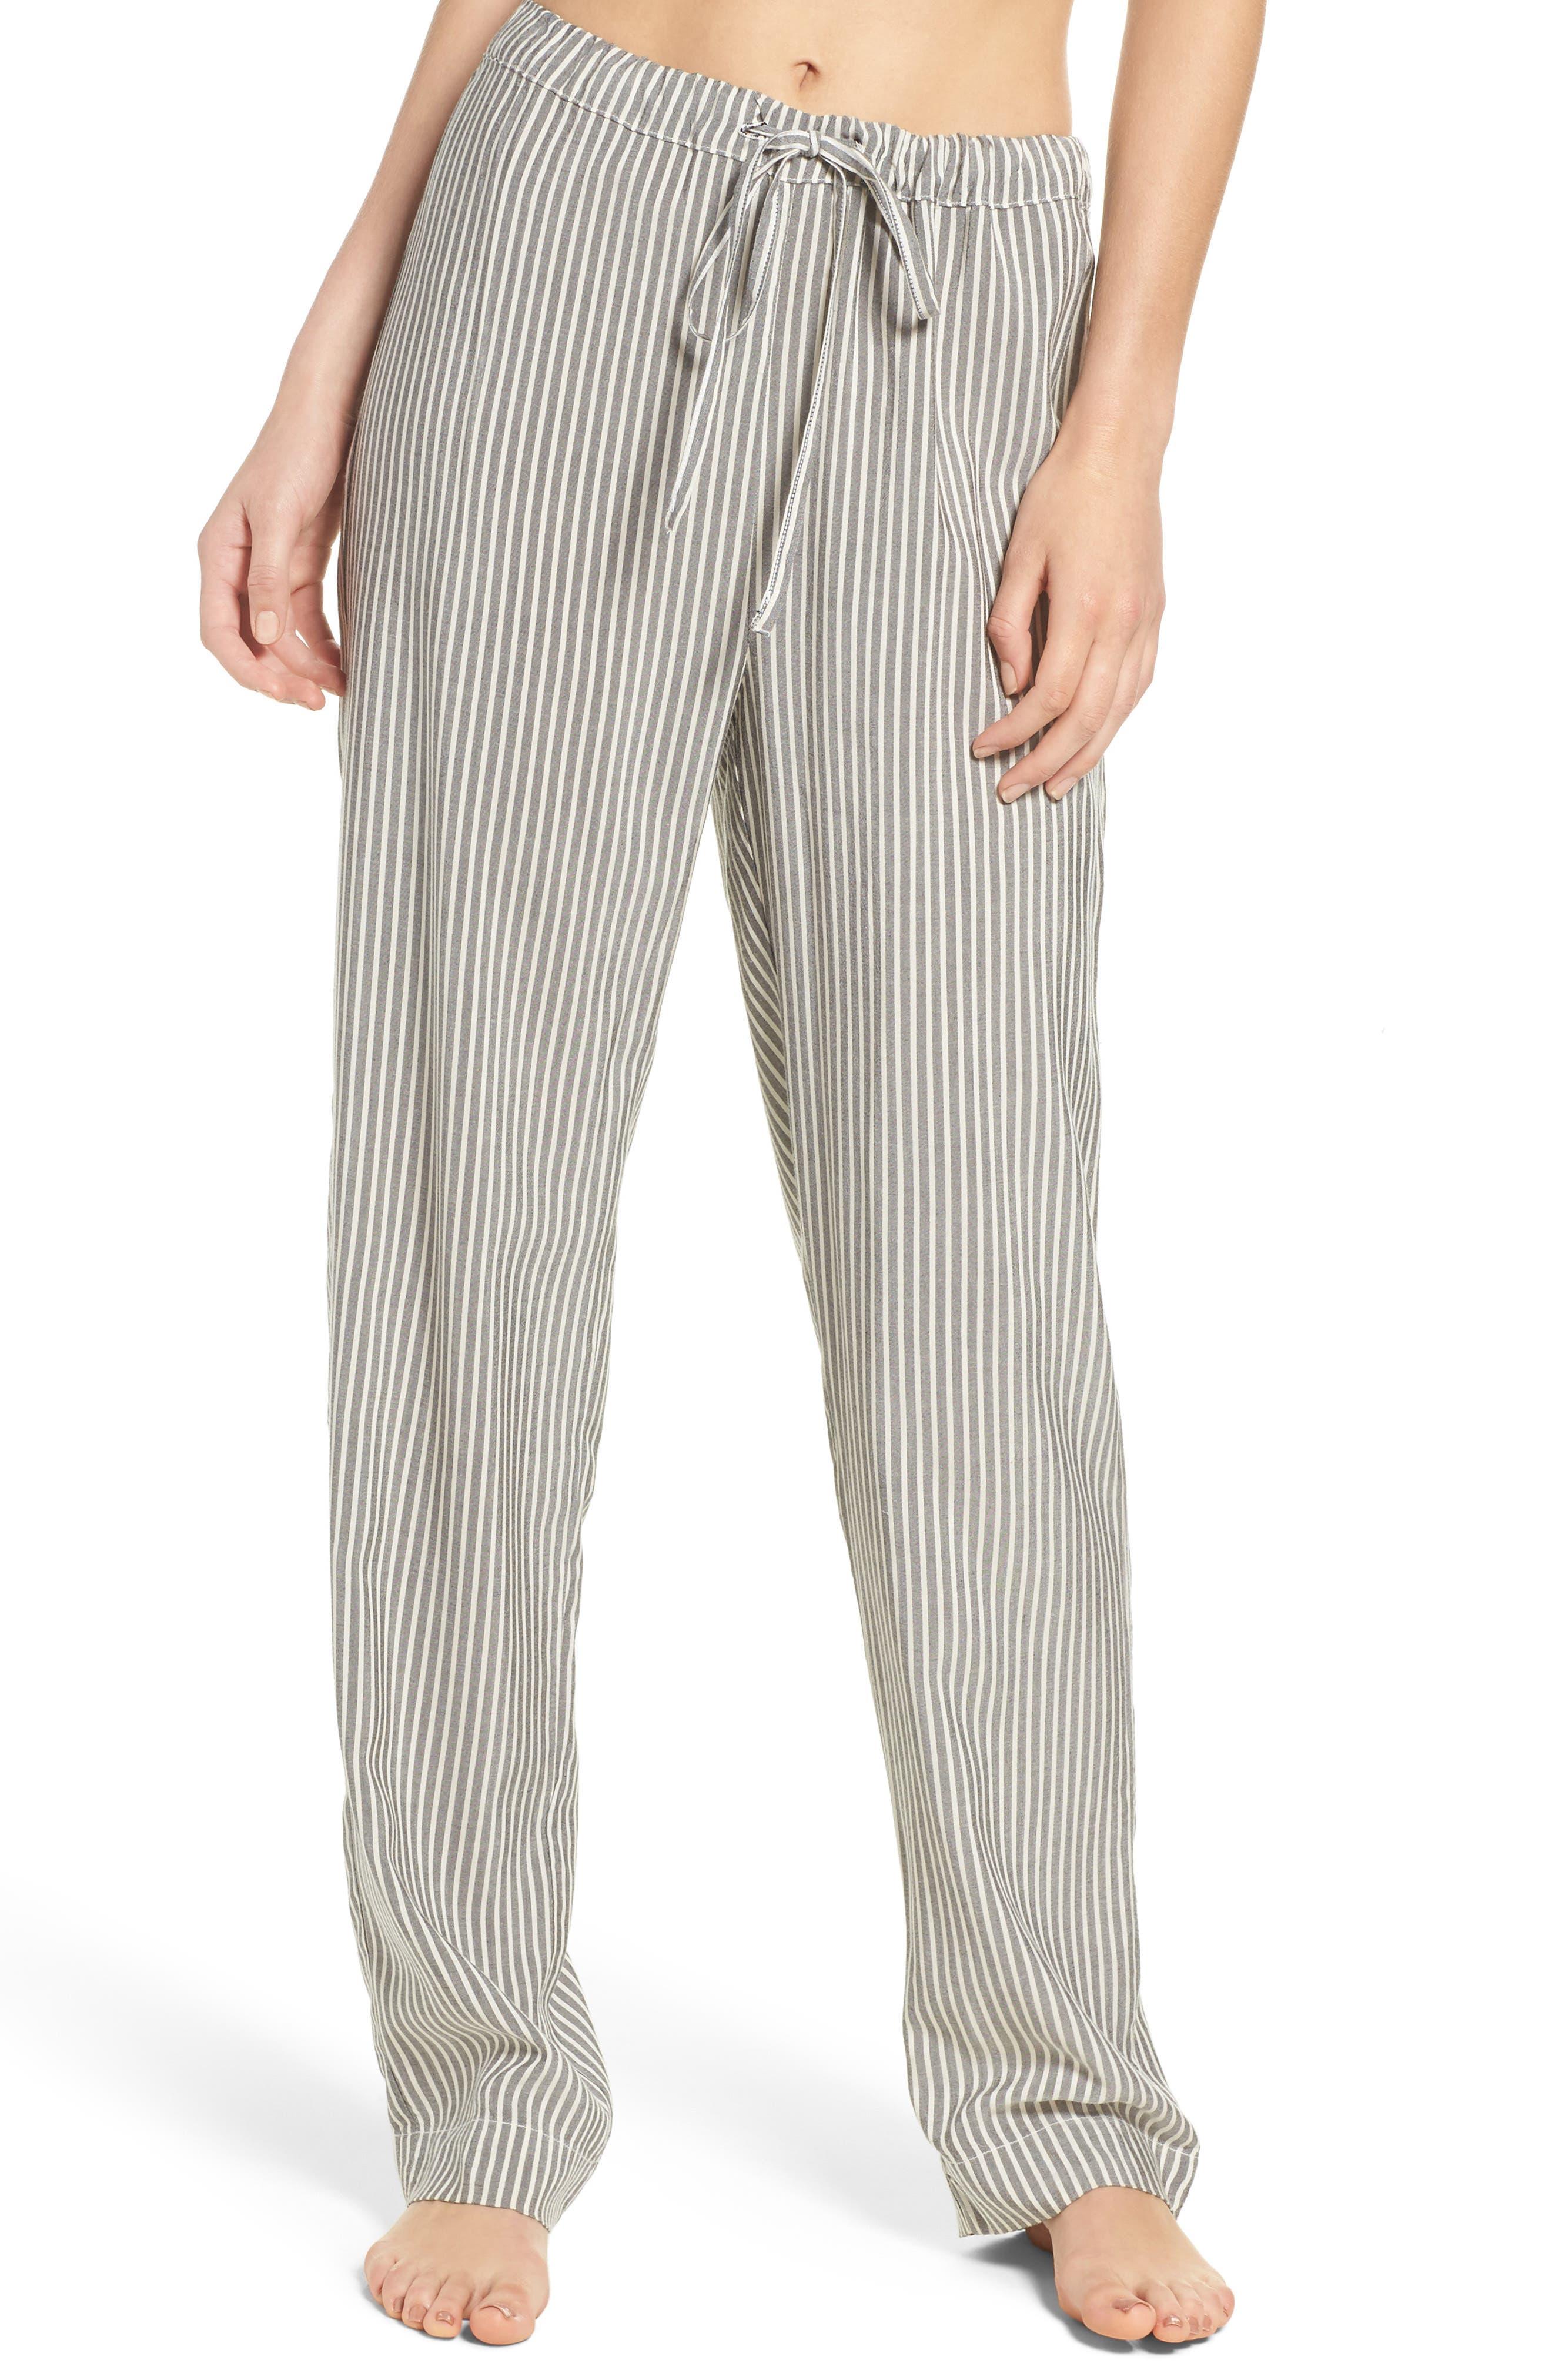 Stripe Pajama Pants,                             Main thumbnail 1, color,                             020